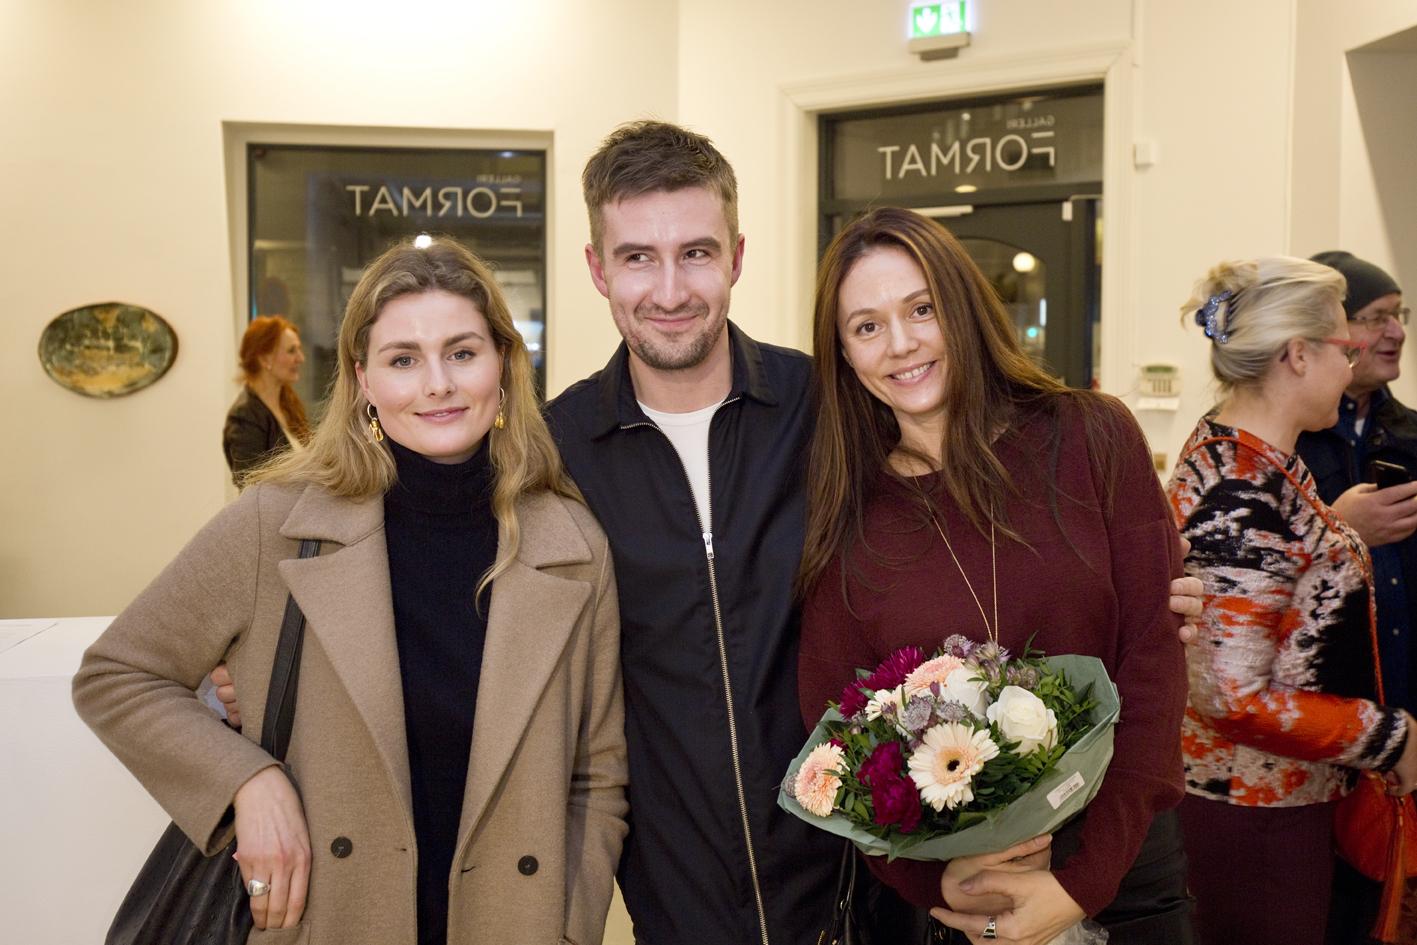 Designers Annie Berner, Vlad Kladko, Benedicte Sparstad